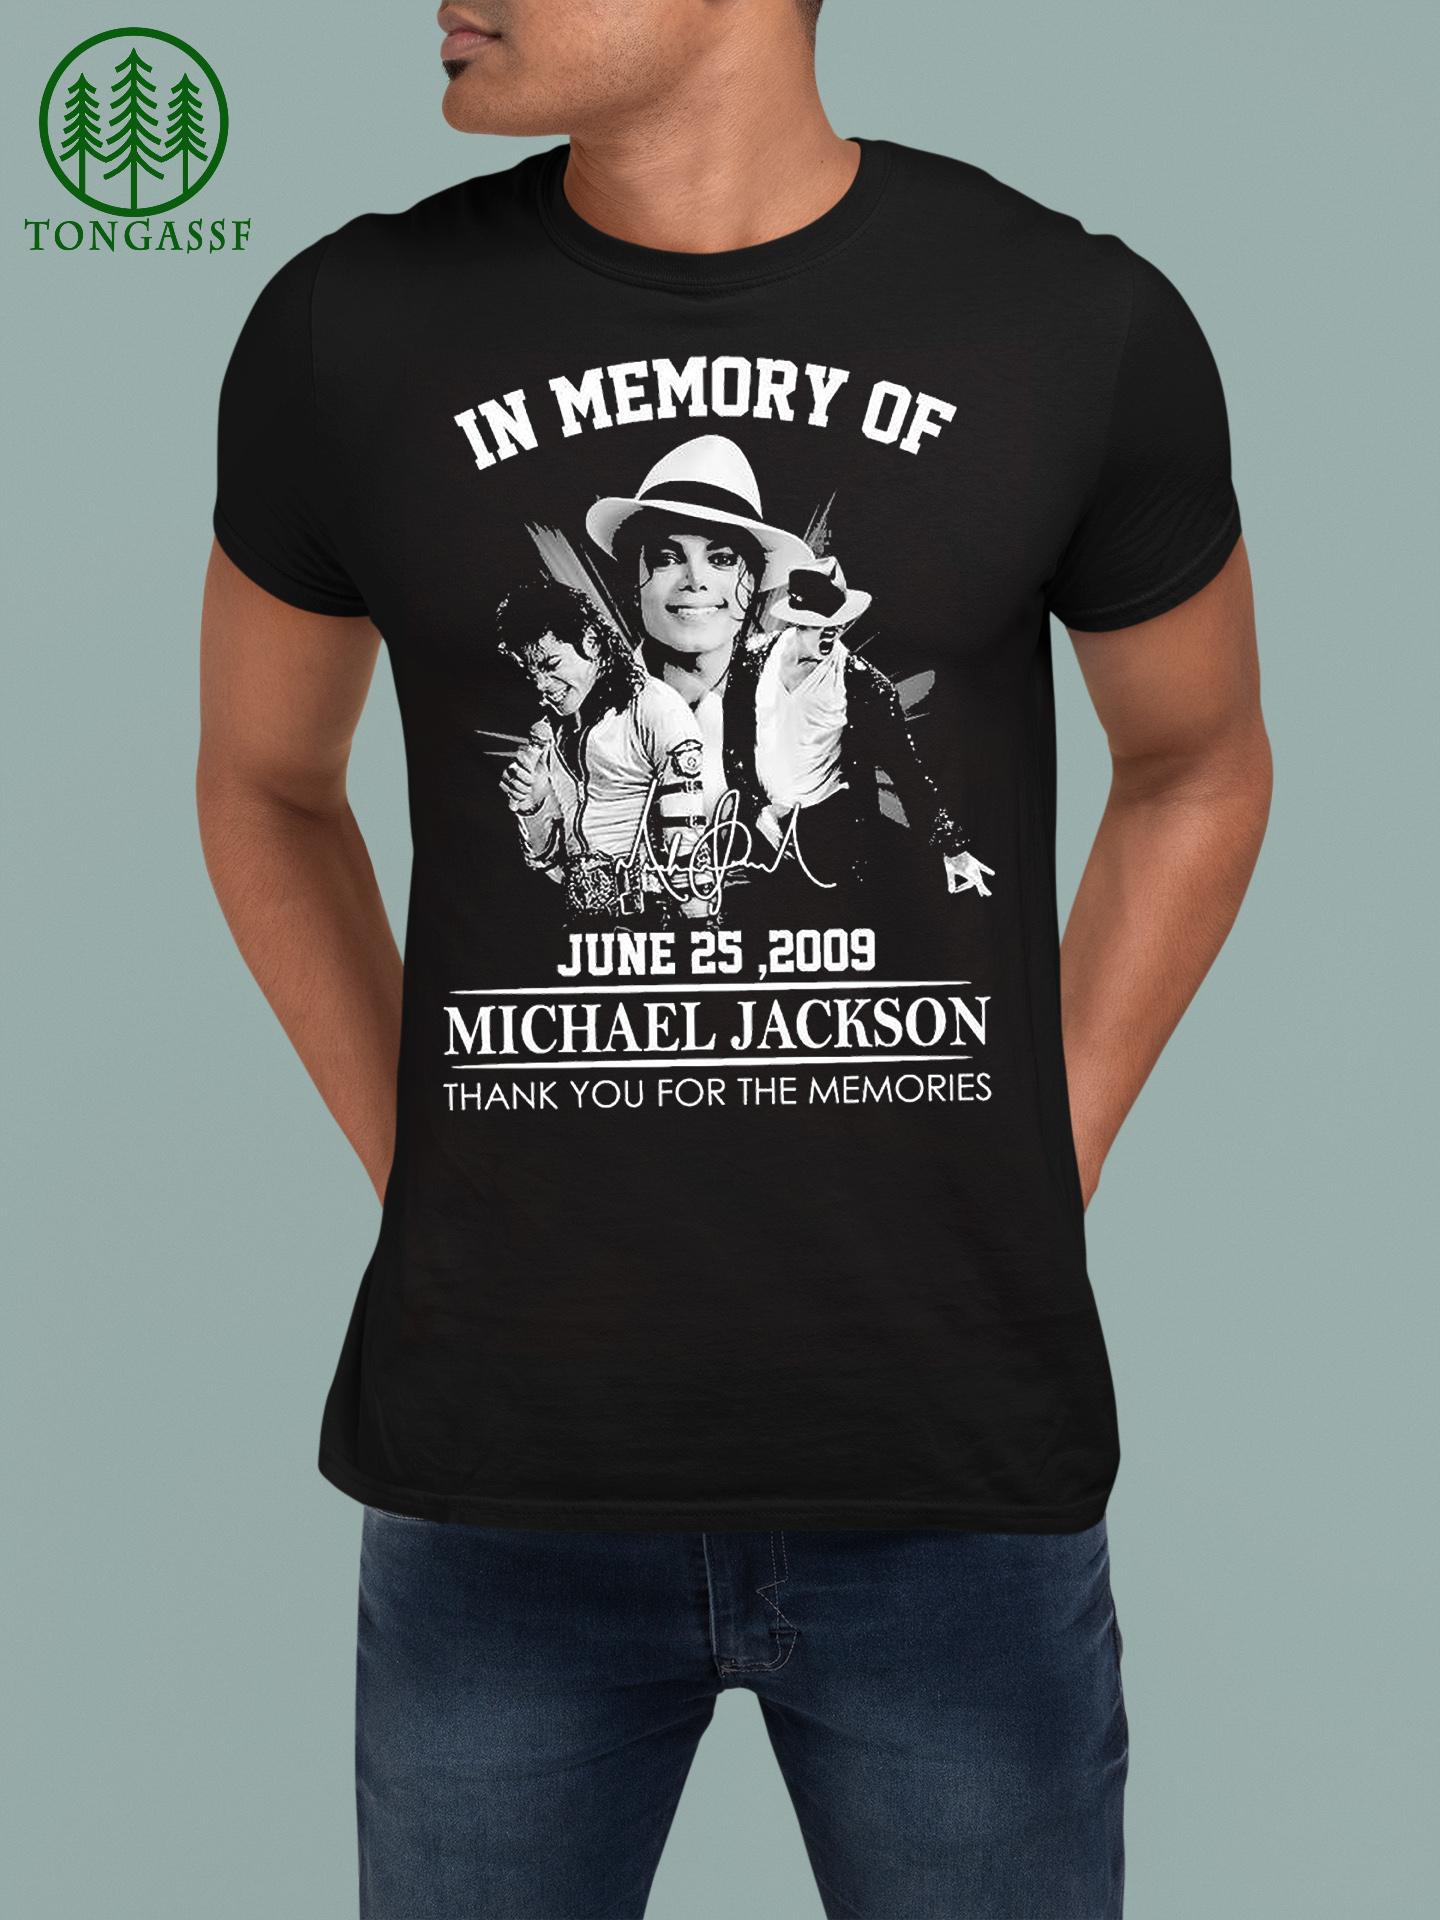 June 25 2009 Michael Jackson thank you for the memories shirt